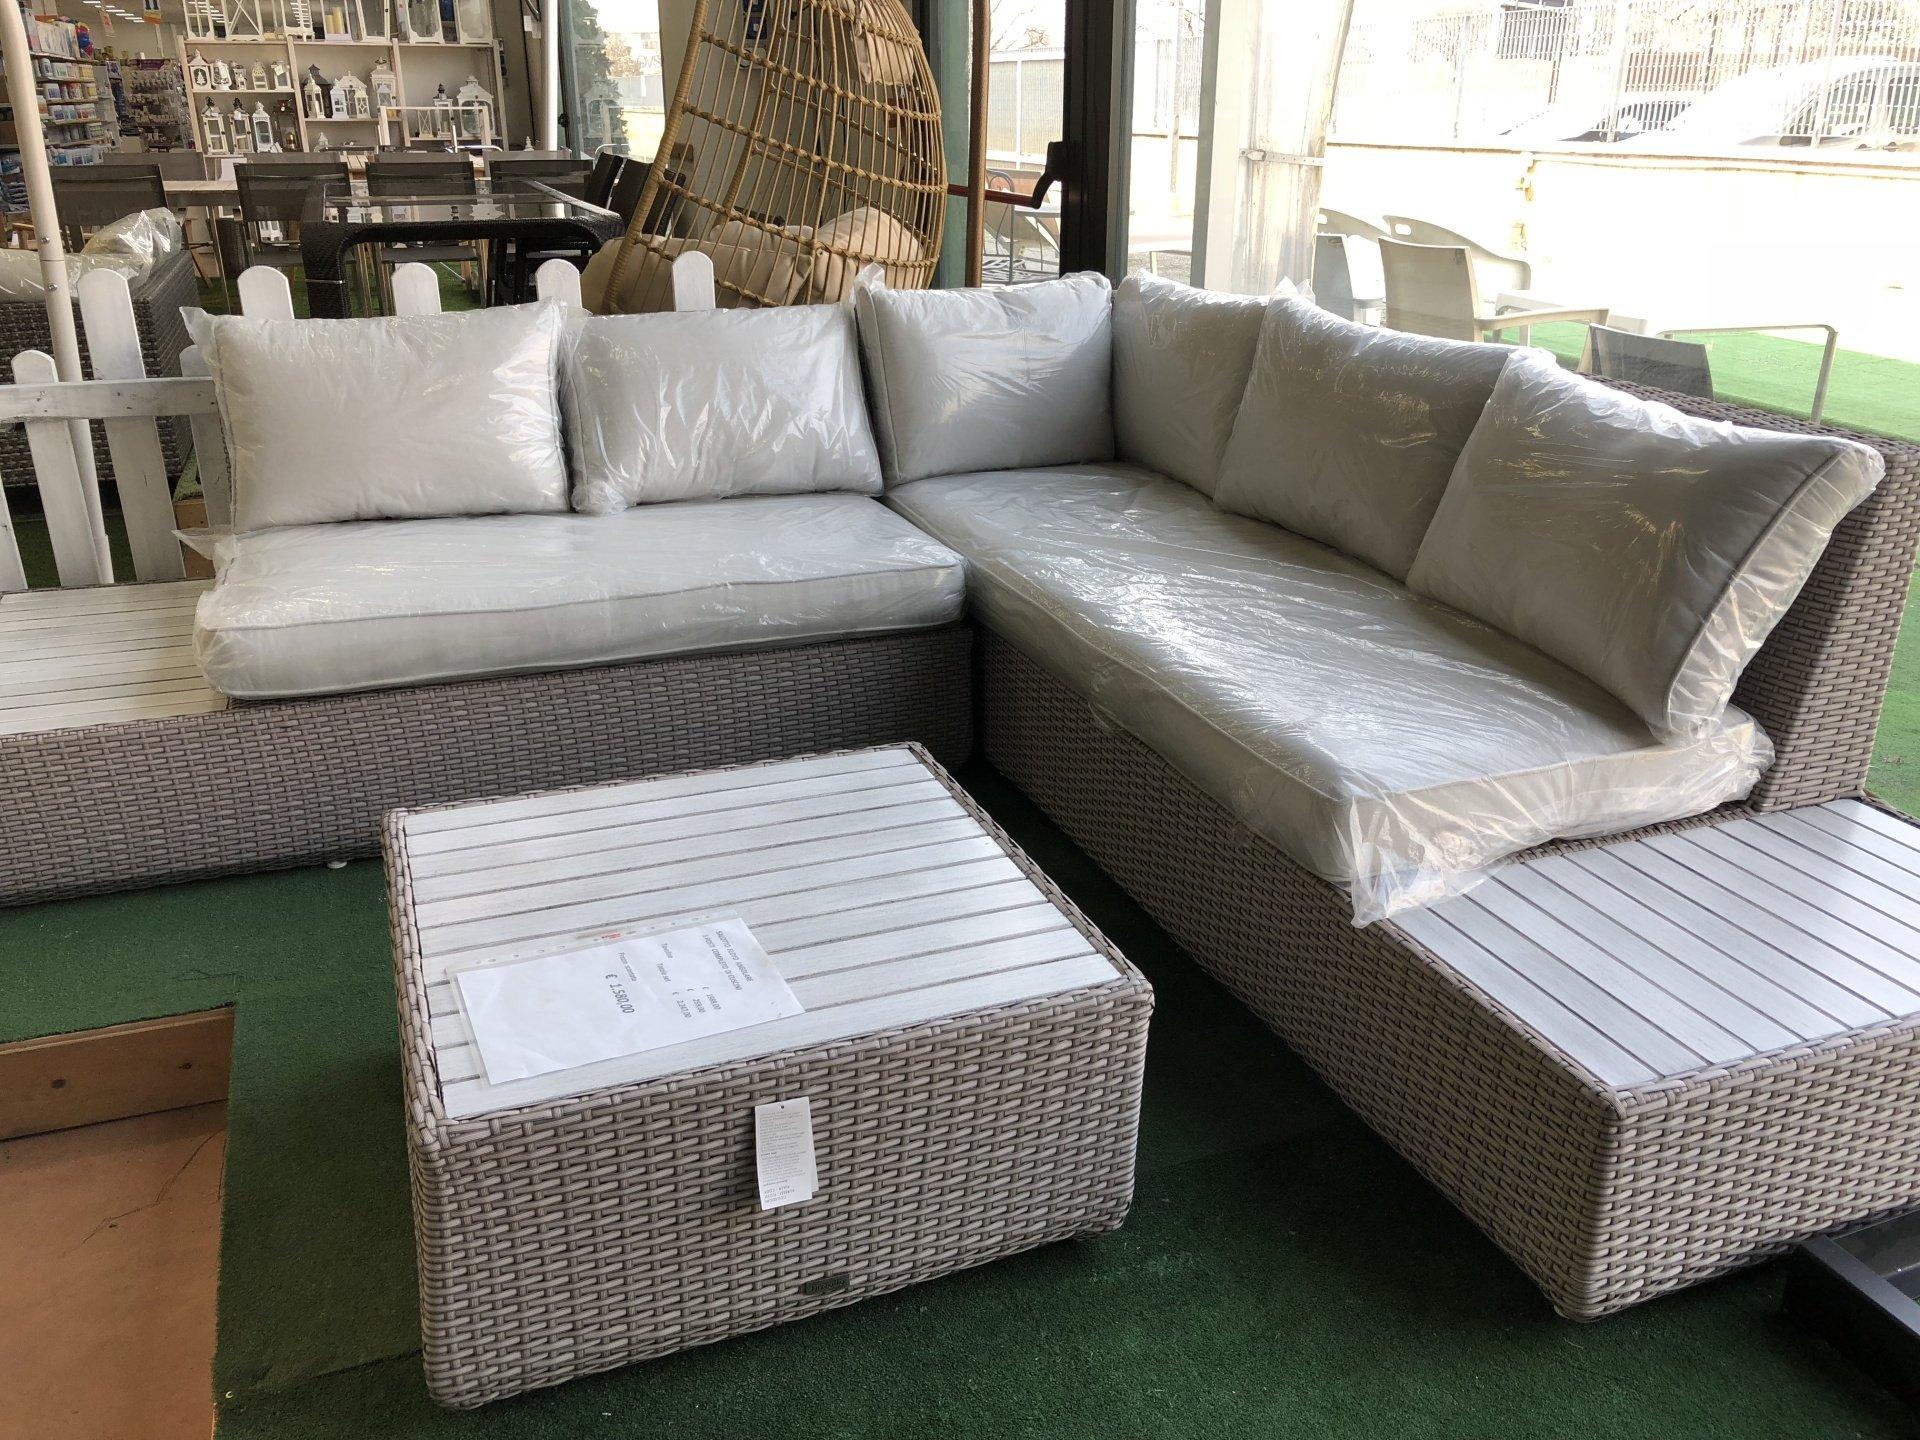 Vendita mobili da esterno brescia bergamo emporio for Svendita mobili da giardino